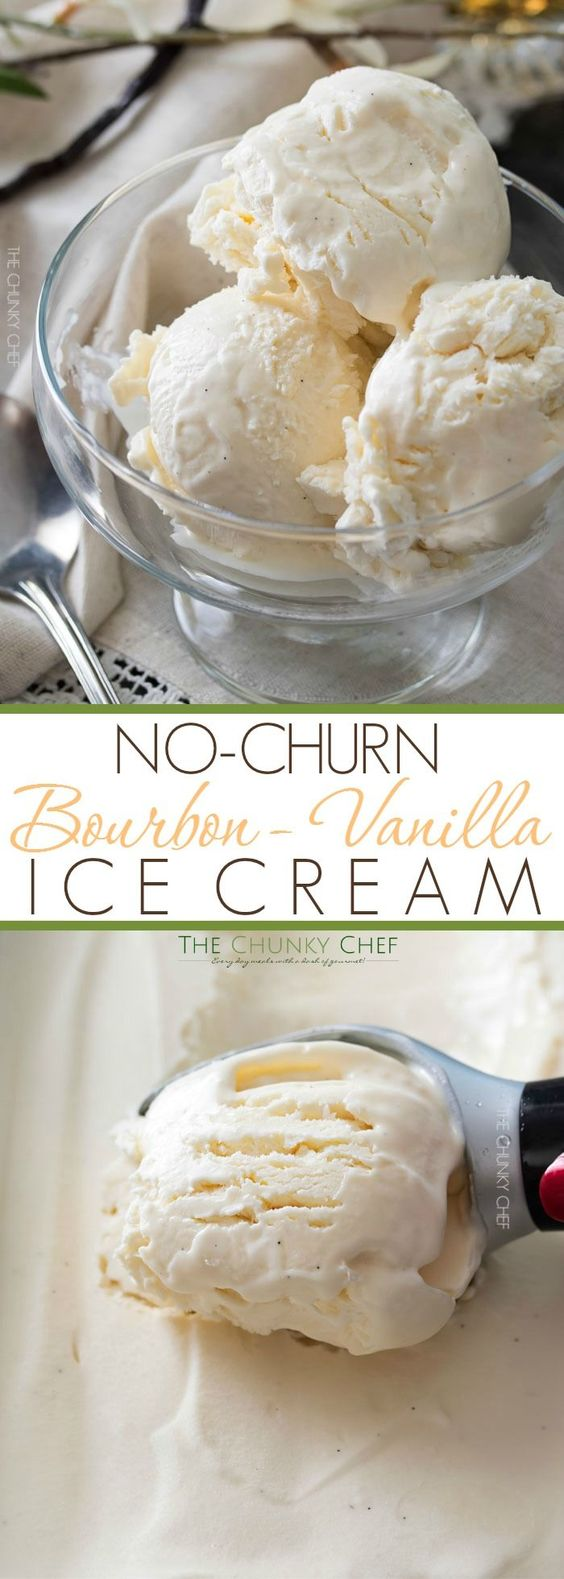 Bourbon Vanilla No Churn Ice Cream | This rich and creamy no churn ice cream is…